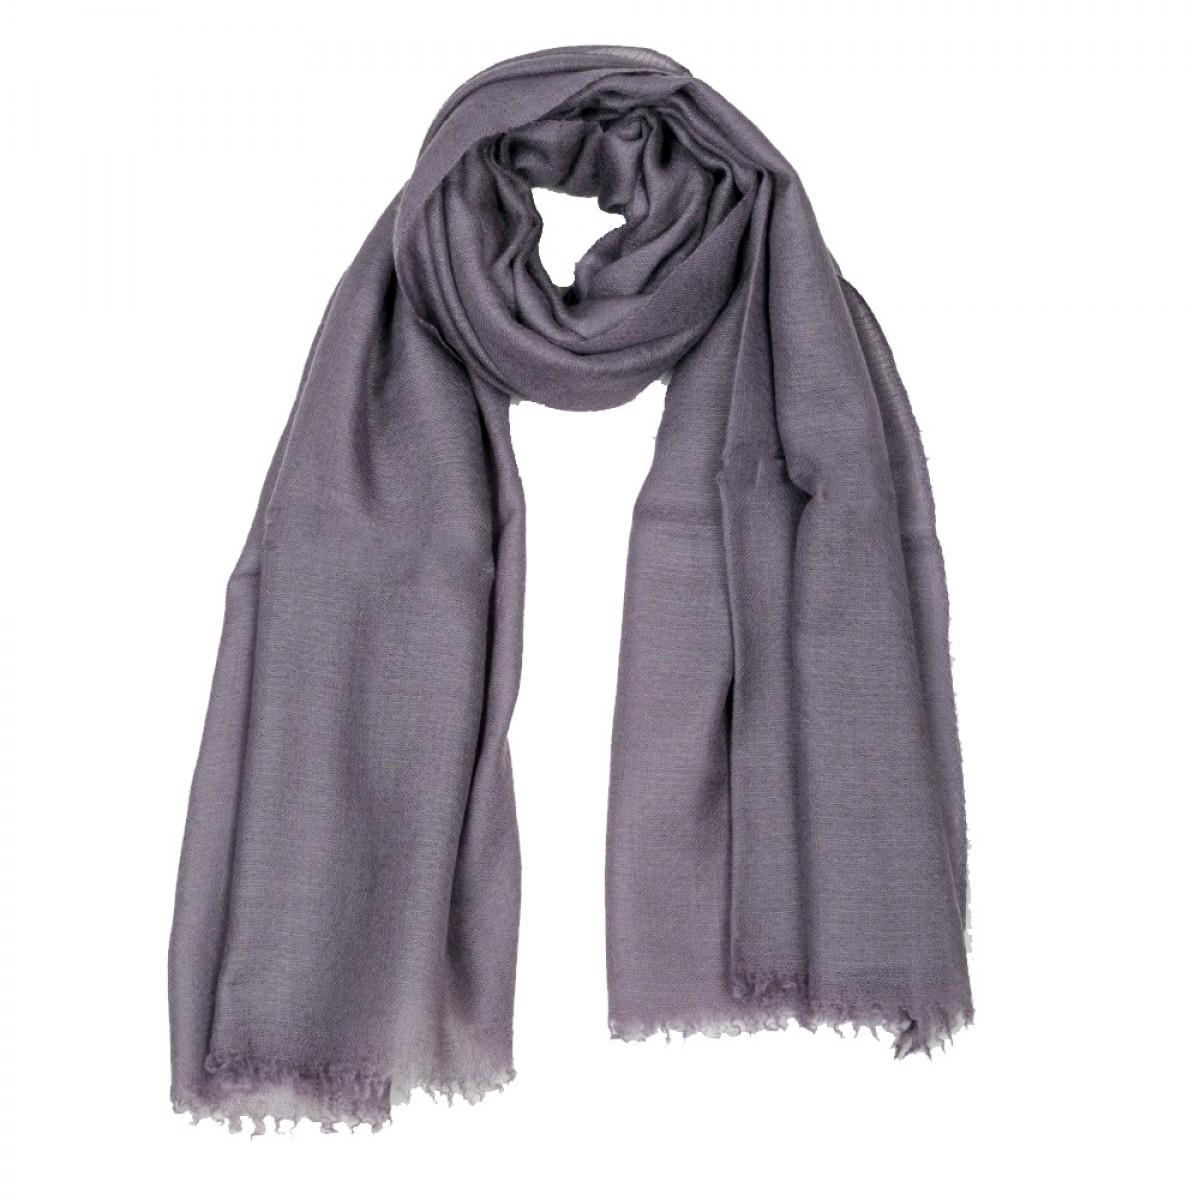 Plain Pashmina Stole - Purple Haze